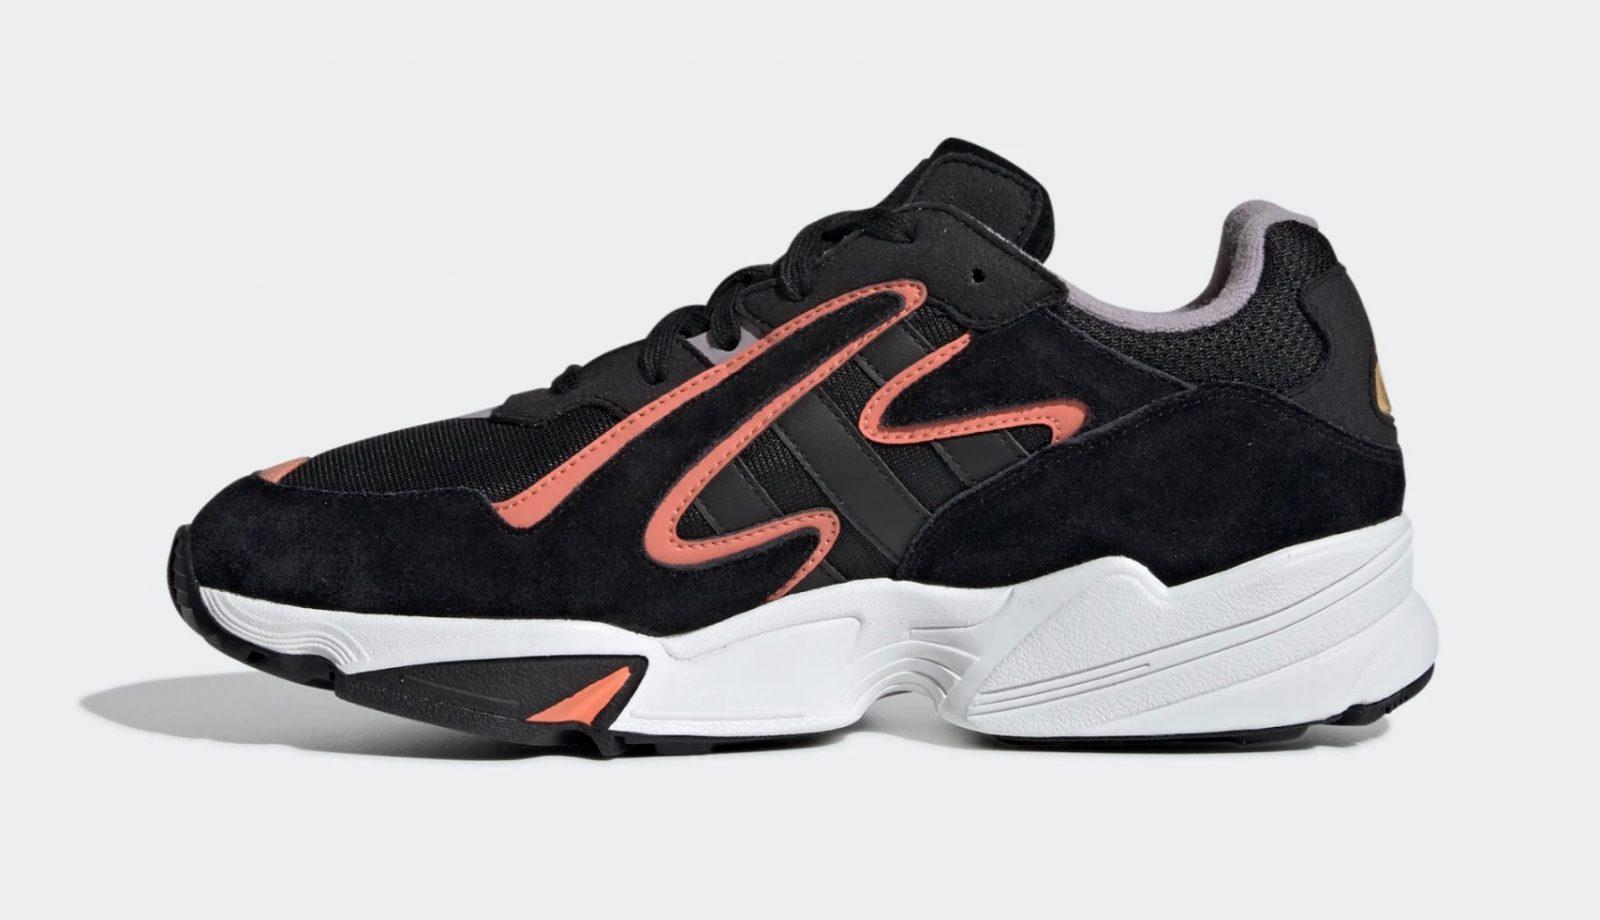 adidas Yung 96 Chasm Black Coral | EE7234